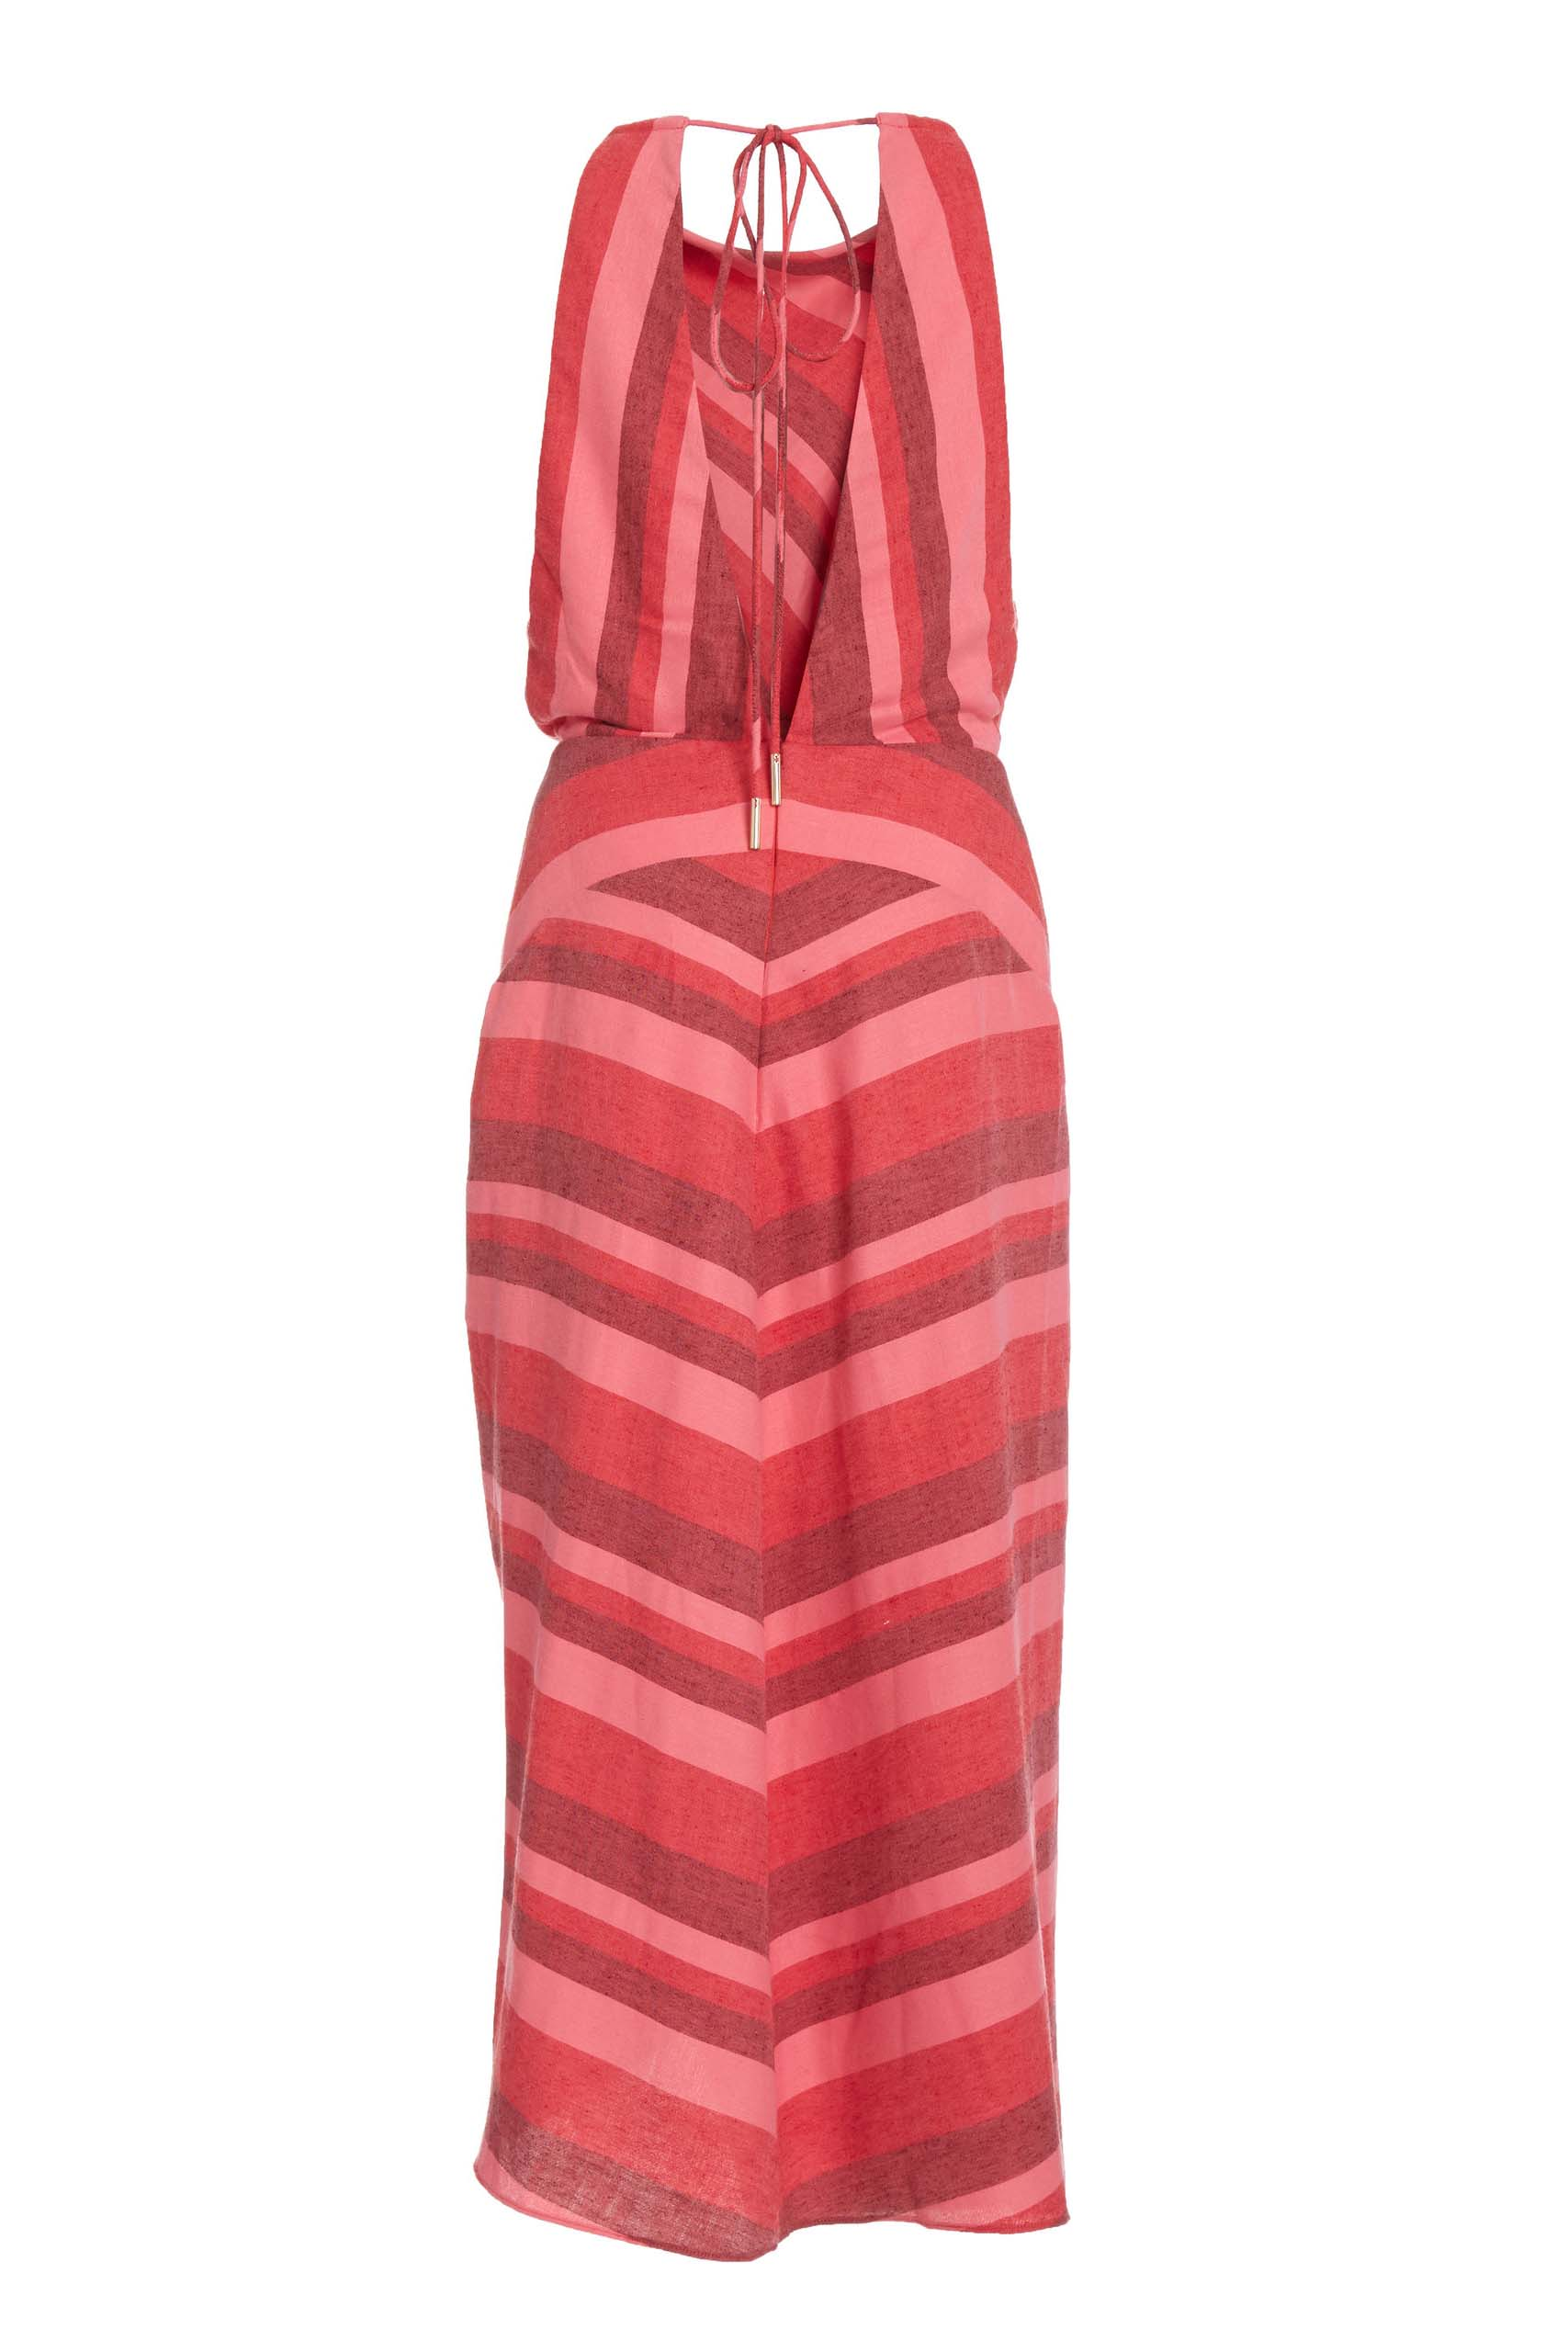 acler-faver-vestido-midi-rojo-fruncido-2